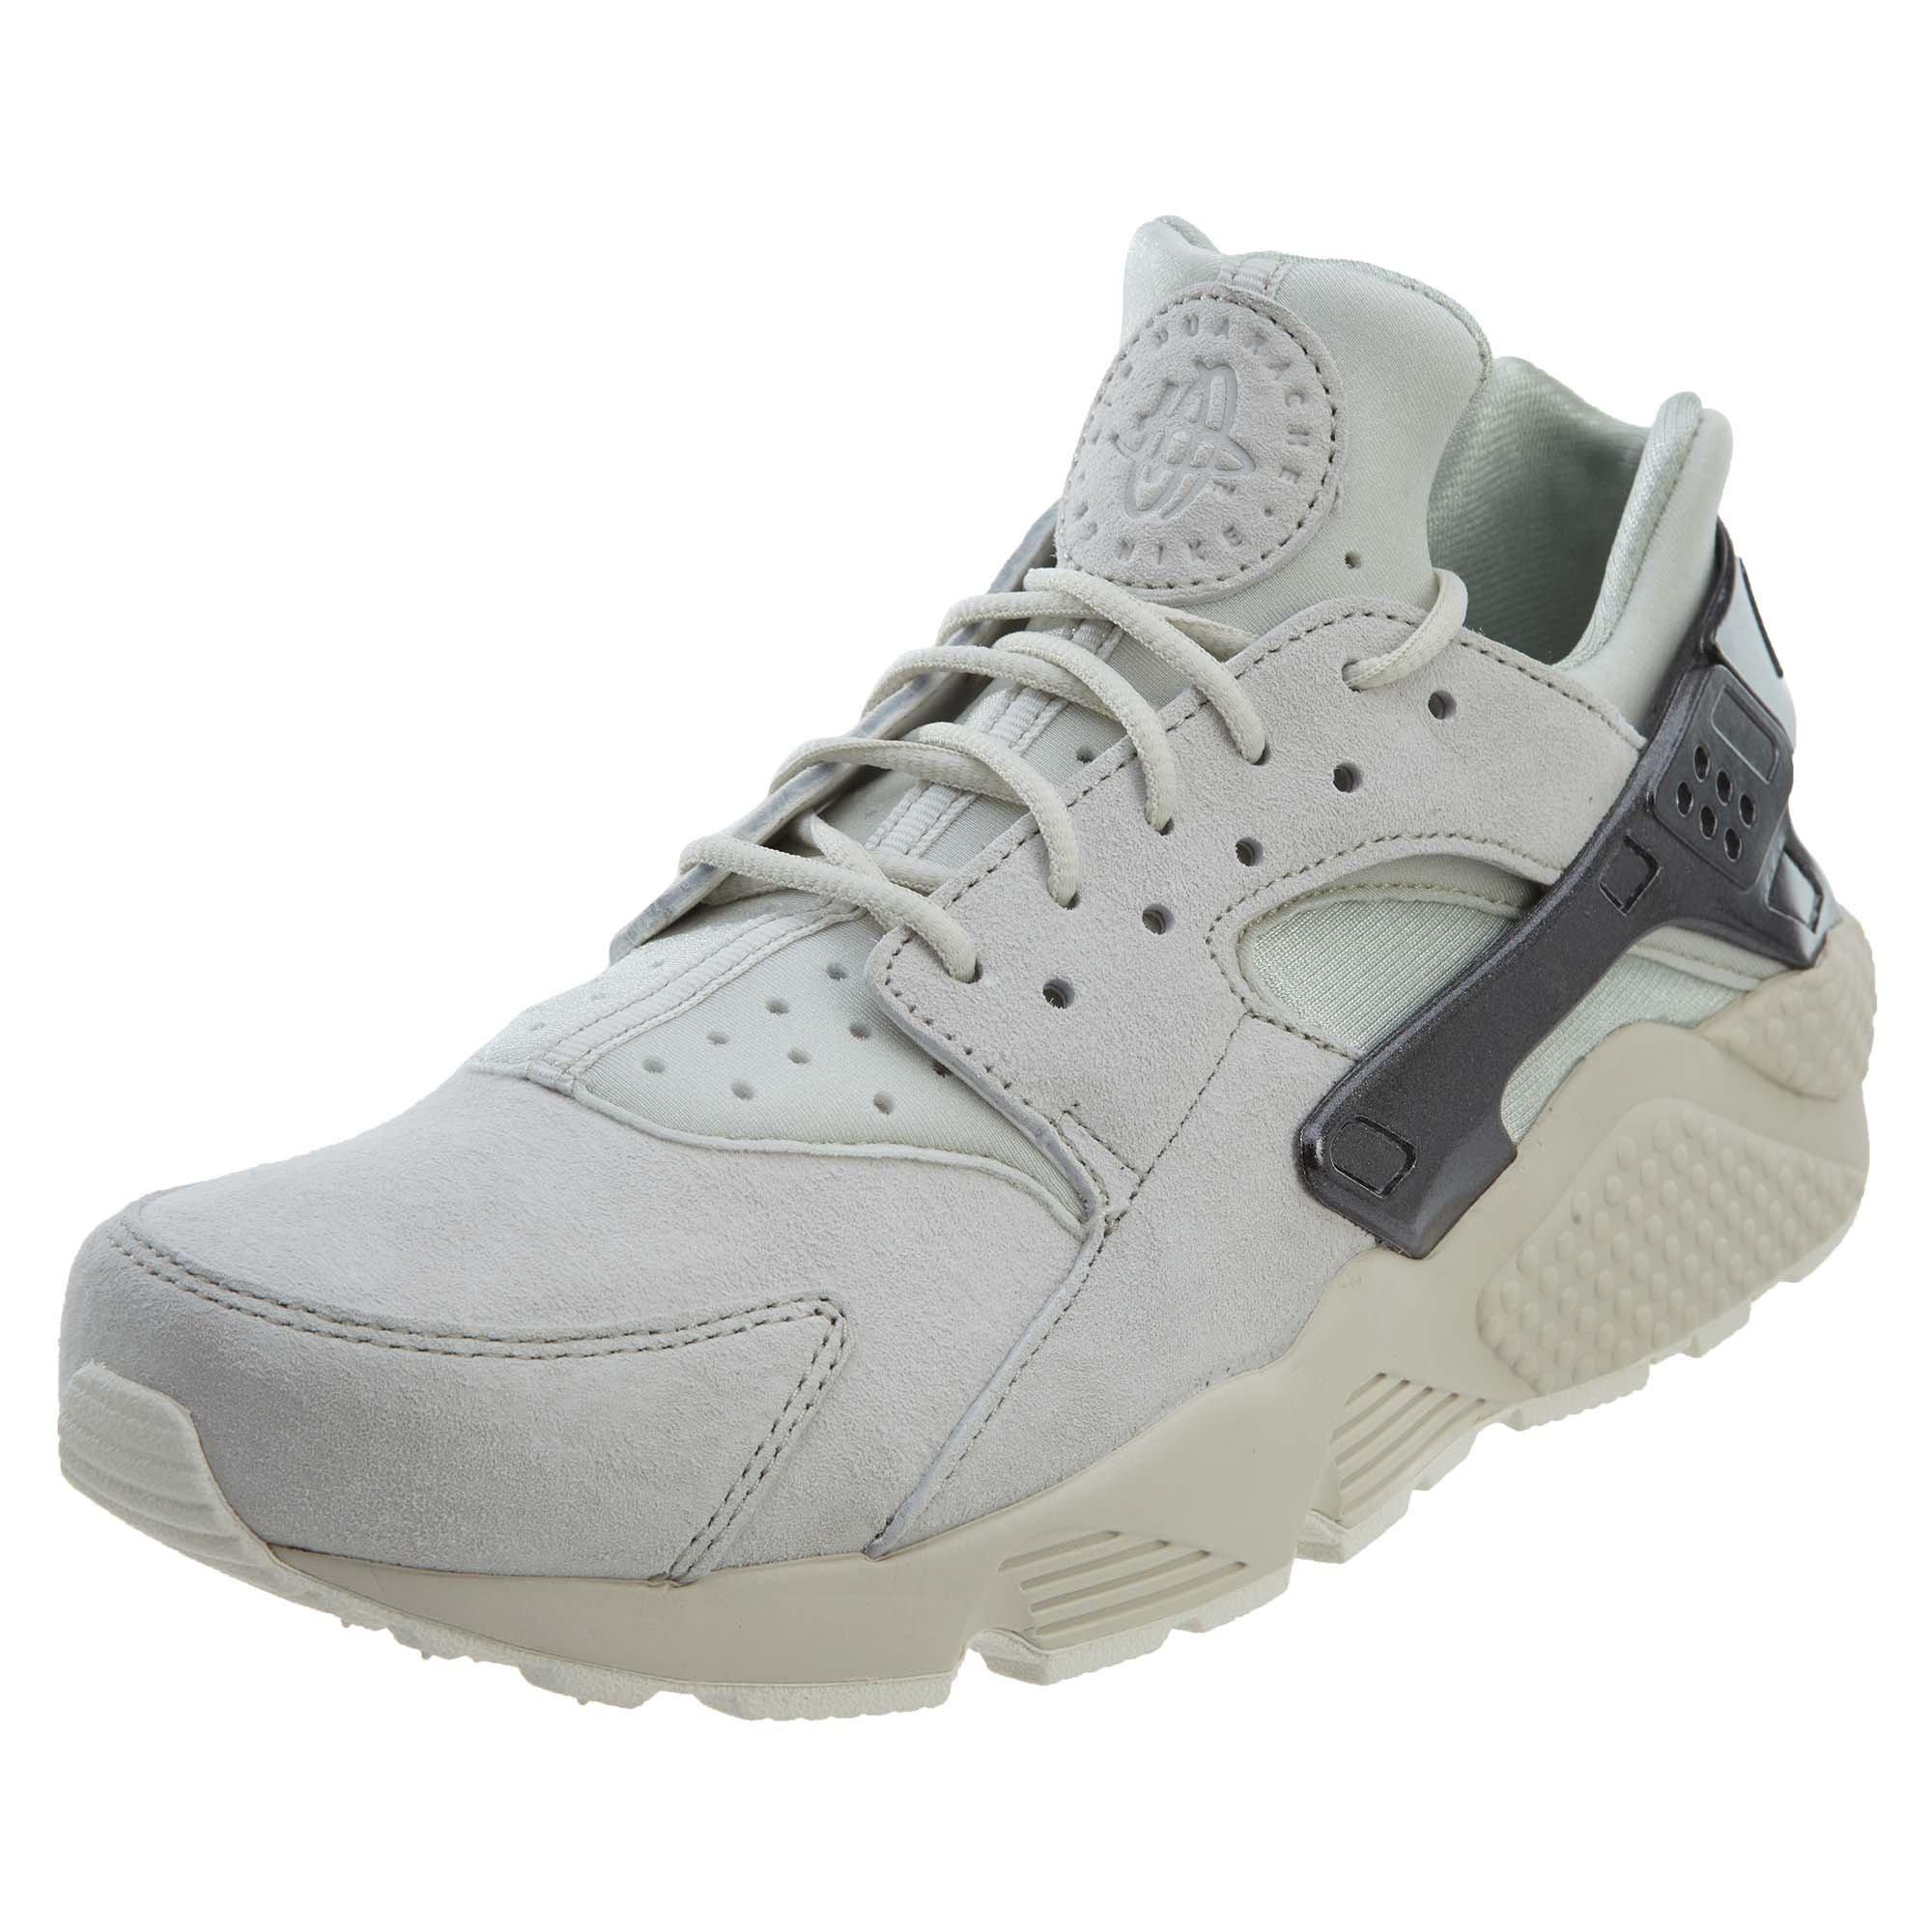 buy popular e3da6 0b233 Galleon - Nike Air Huarache Run Premium